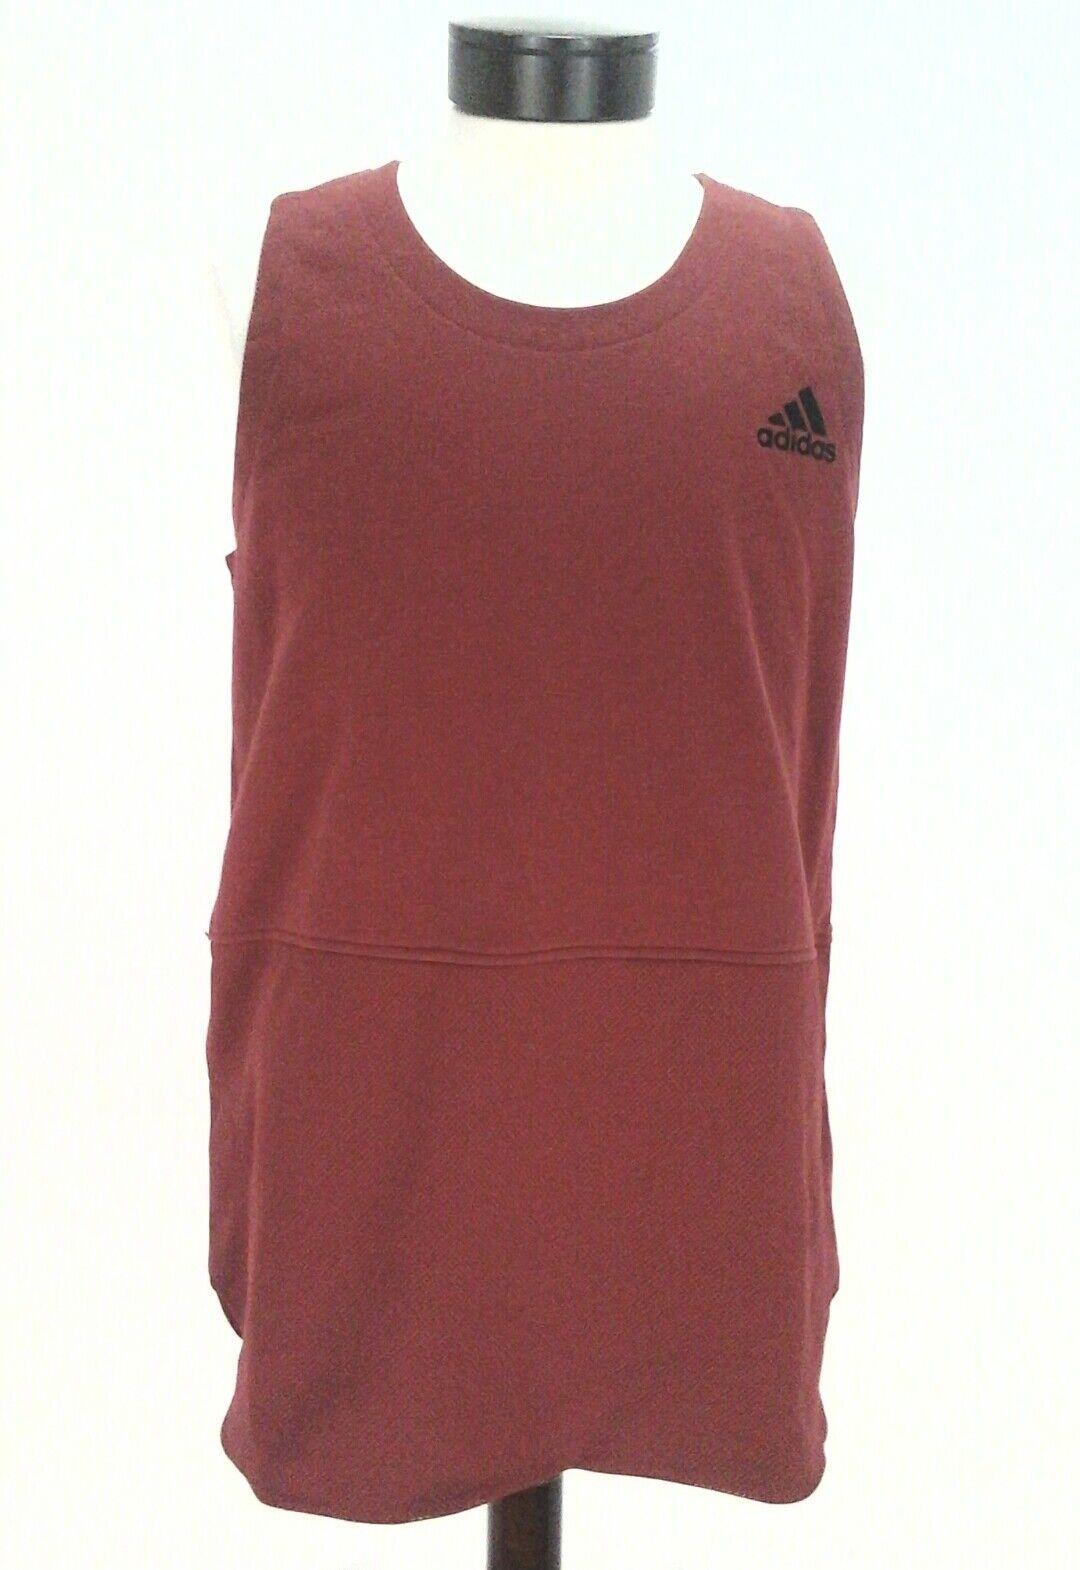 ADIDAS Tank Shirt Maroon Red BASKETBALL French Terry Active BQ1769 Mens XL